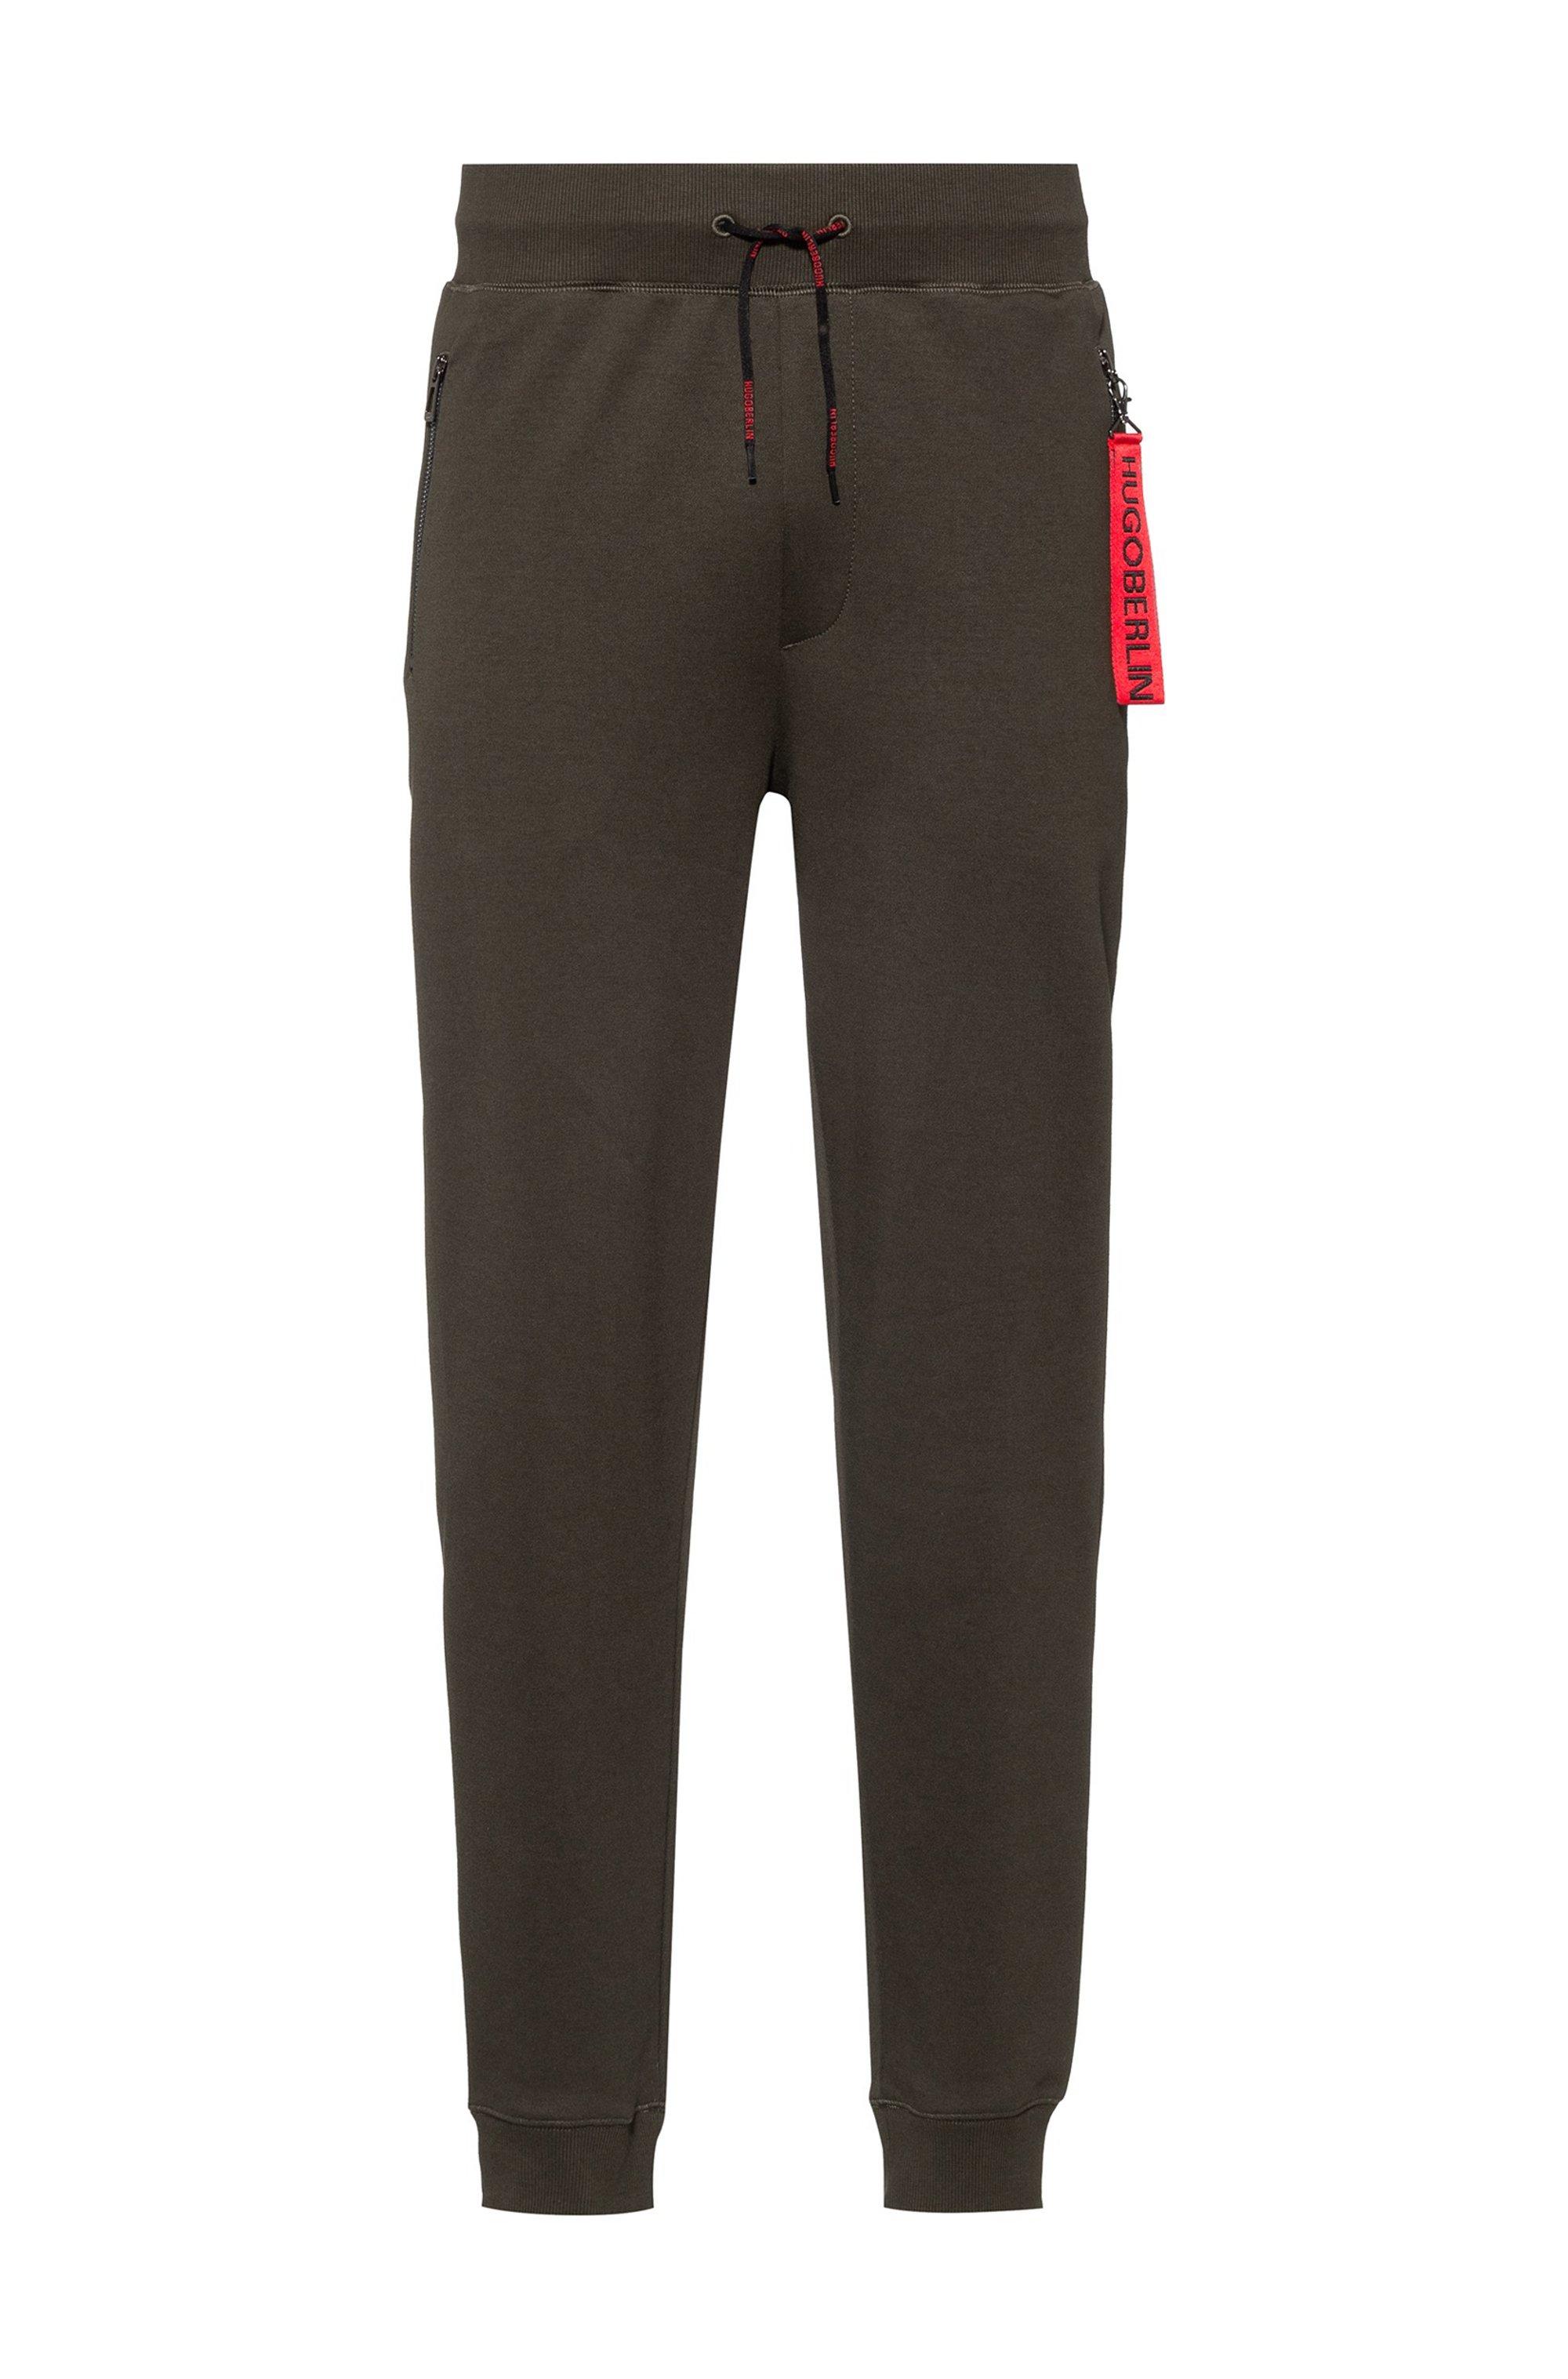 Interlock-cotton tracksuit bottoms with reverse-logo patch, Khaki